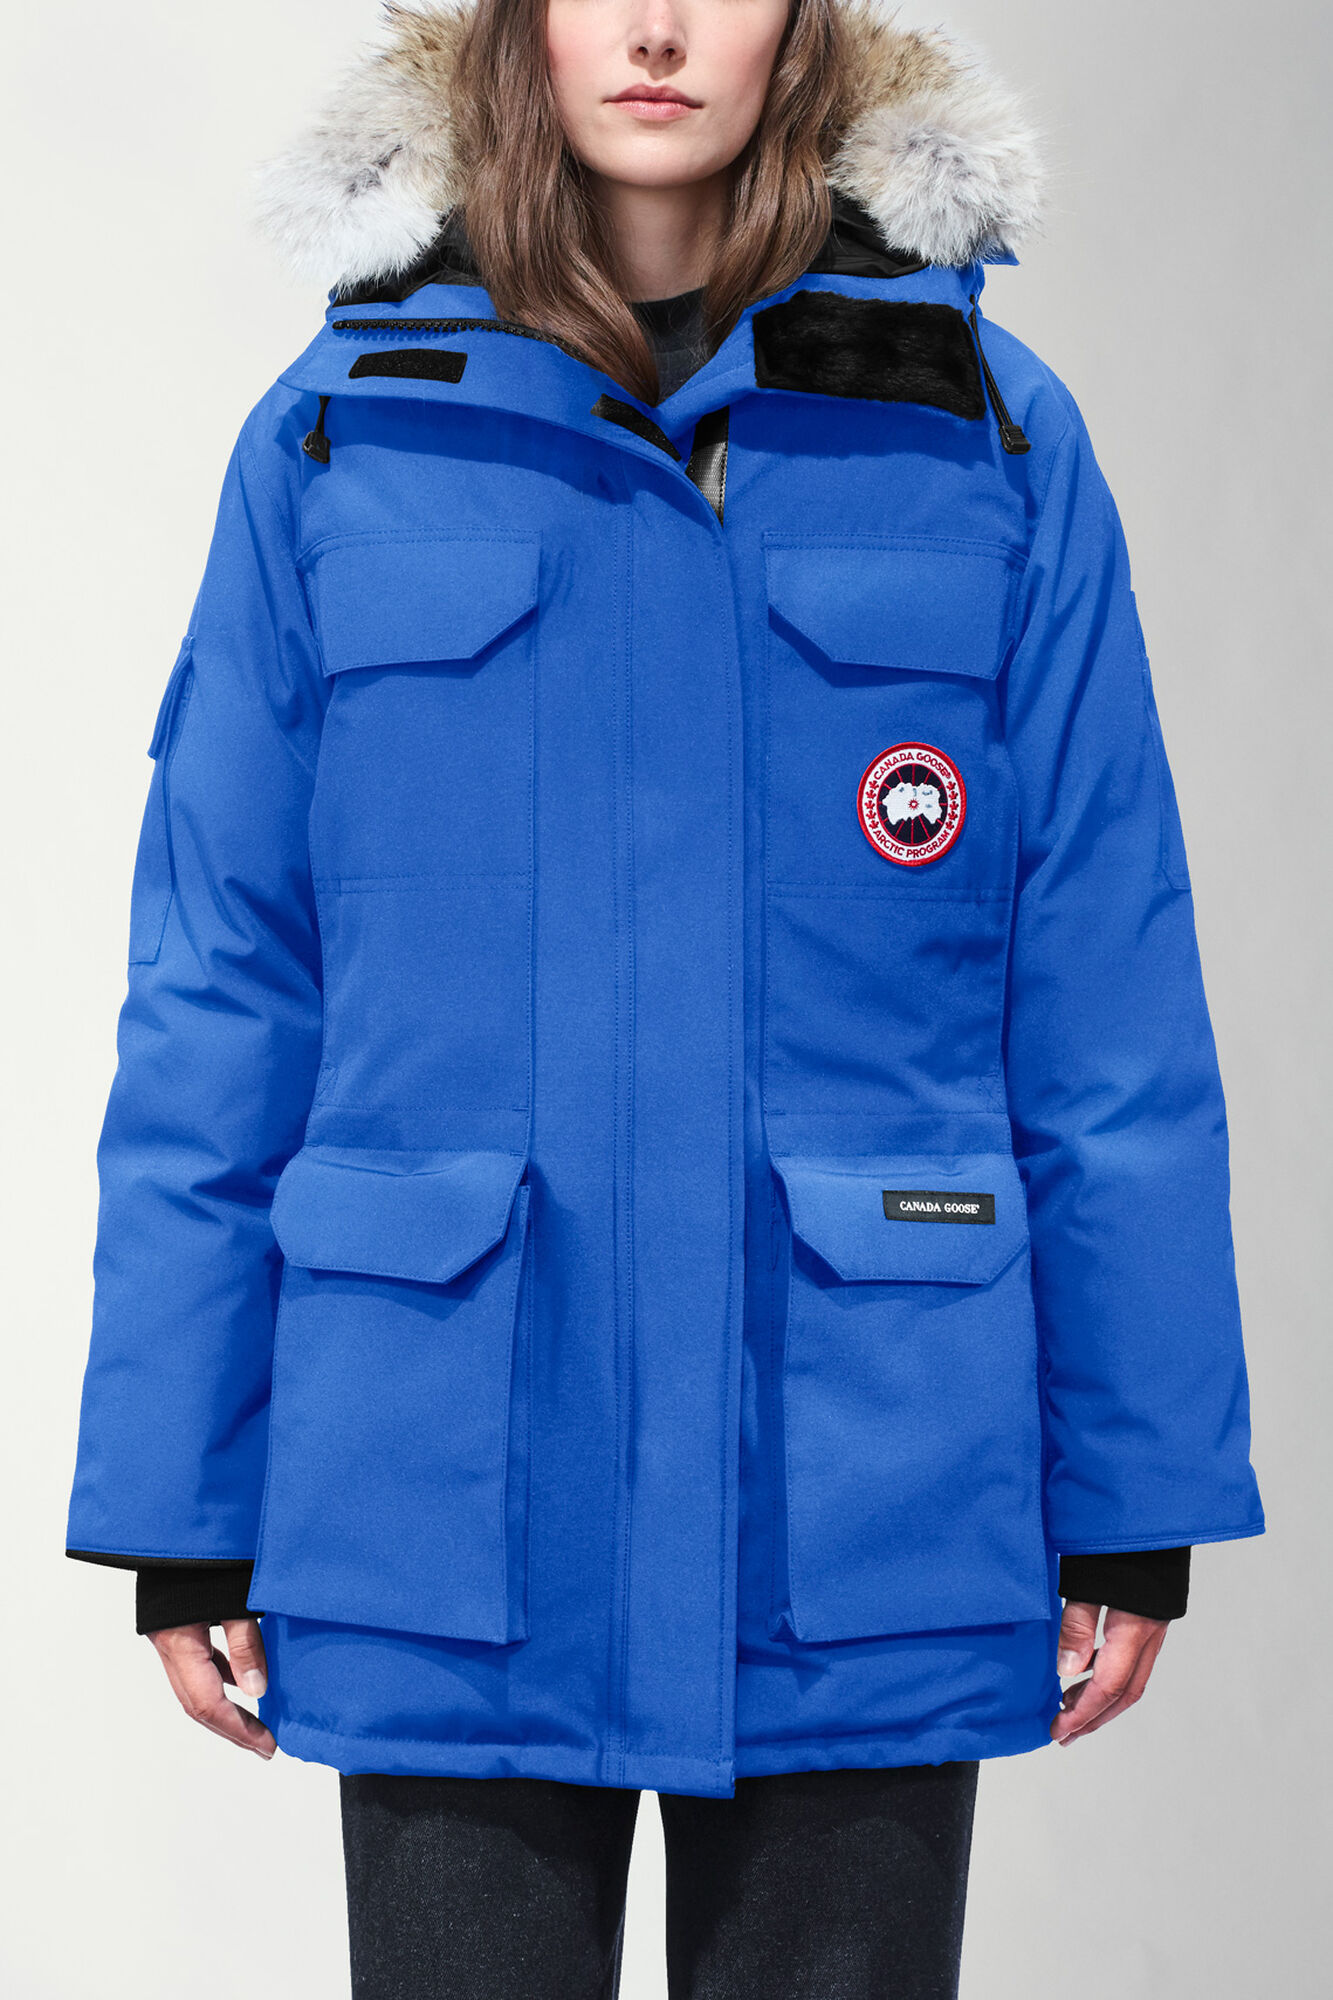 Women's Polar Bears International PBI Expedition Parka | Canada Goose®